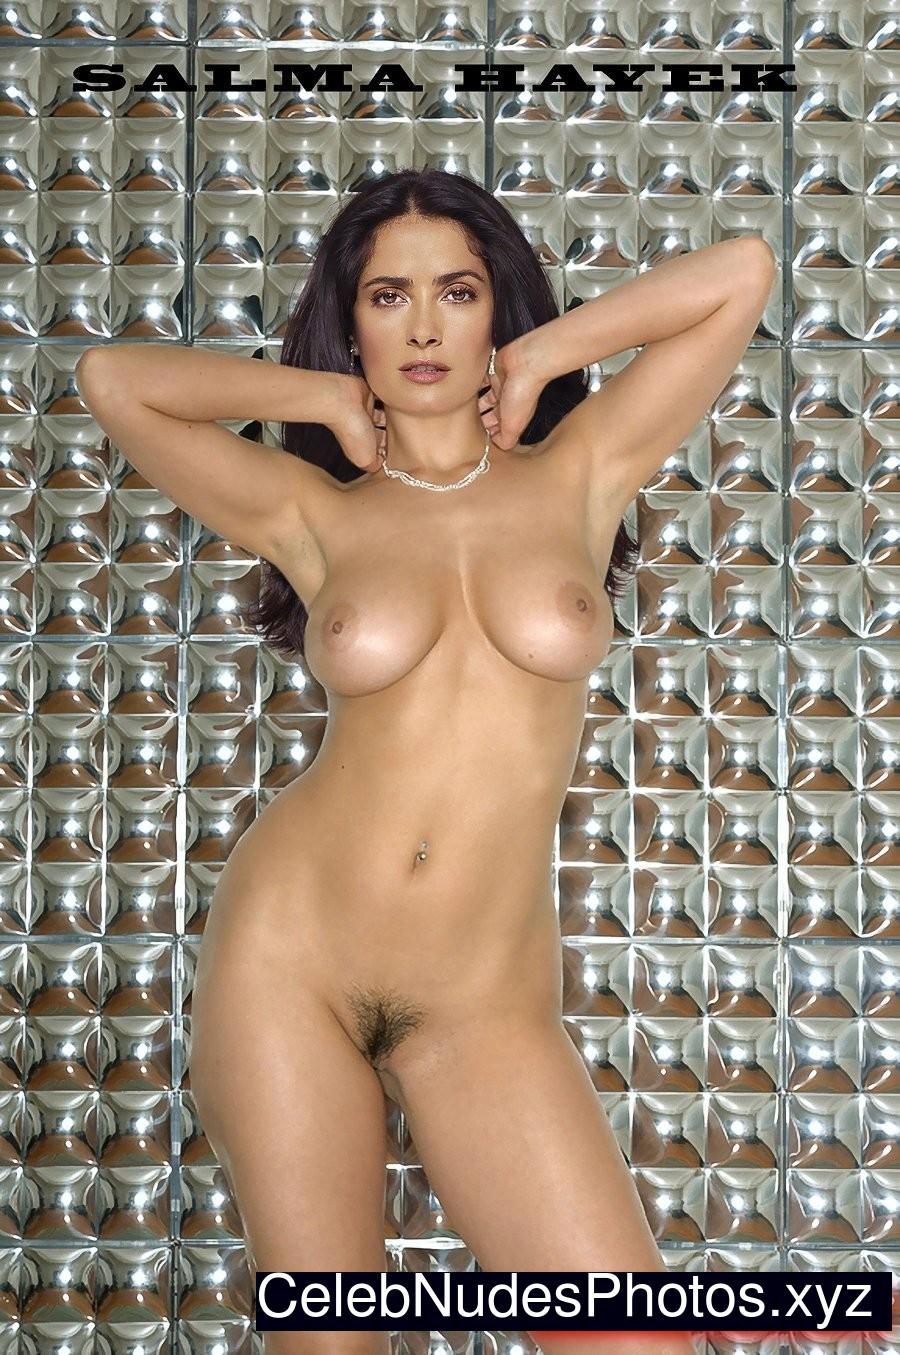 hairy nudist pic post